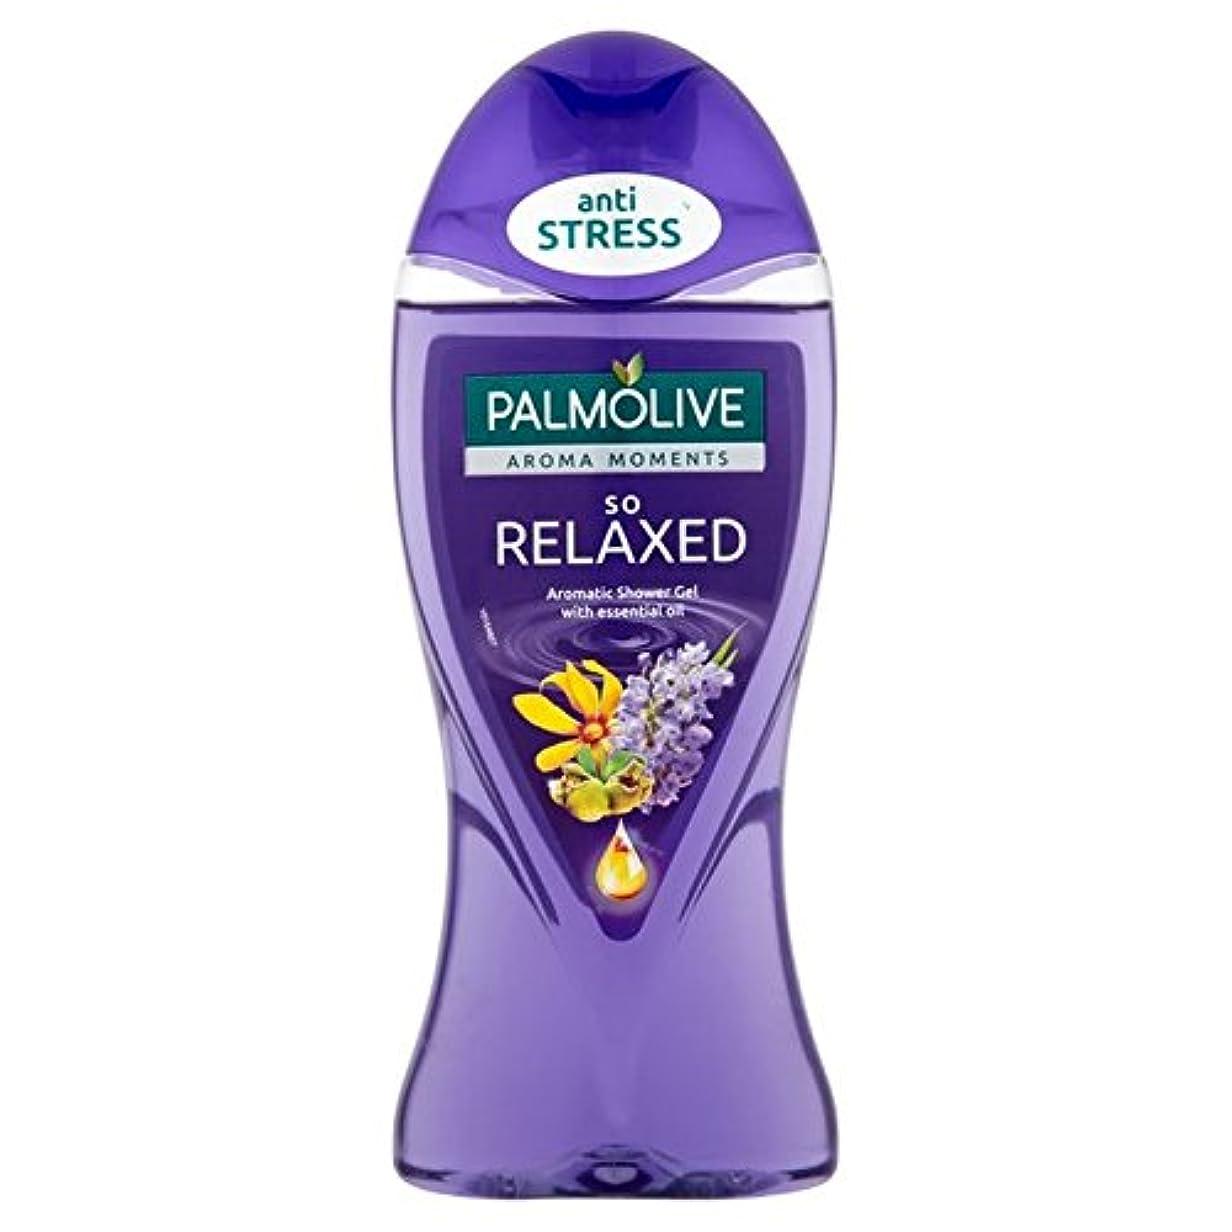 Palmolive Shower Gel Relaxed 250ml (Pack of 6) - パルモシャワージェルリラックスした250ミリリットル x6 [並行輸入品]